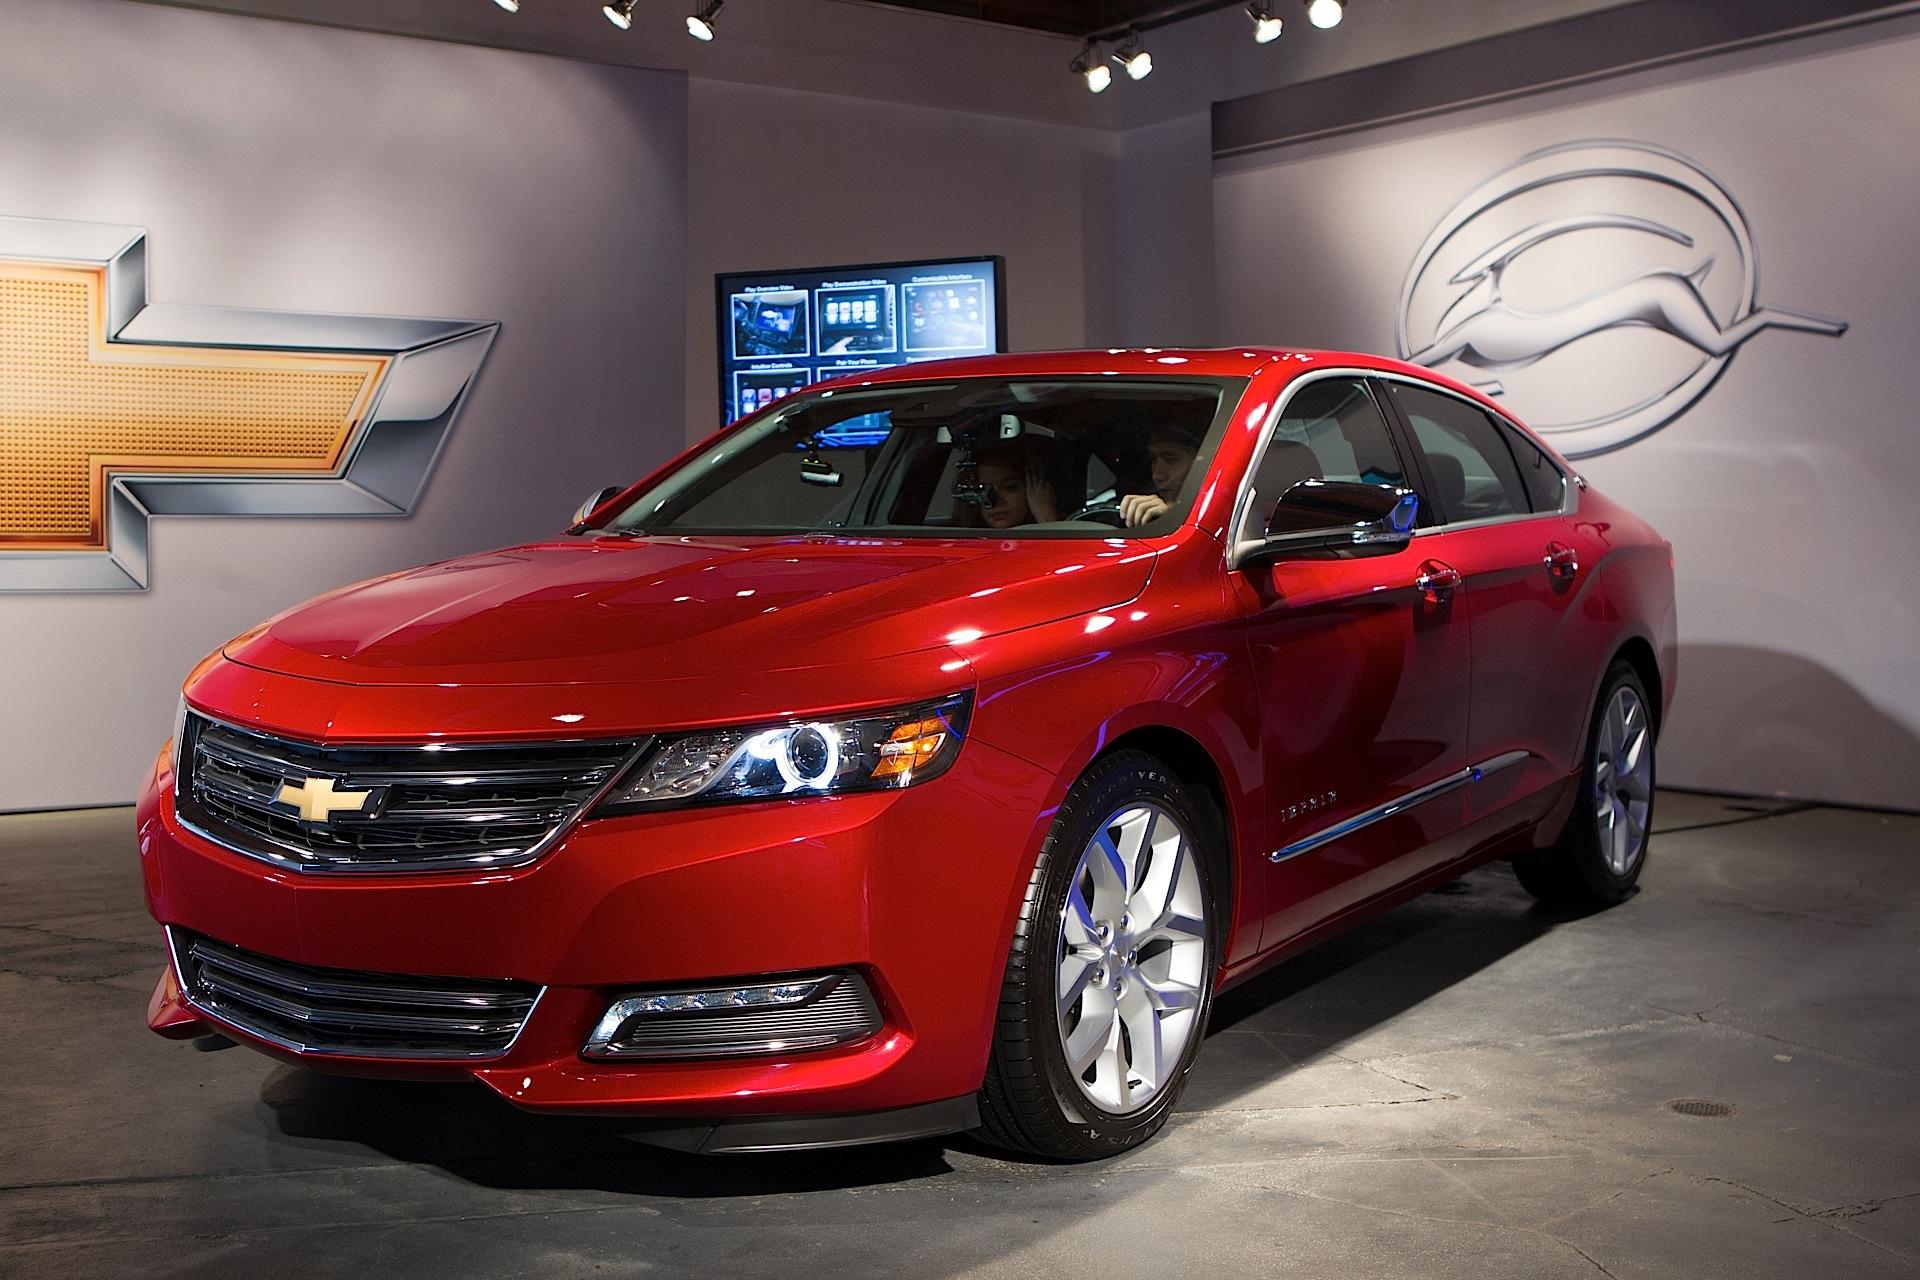 hight resolution of  chevrolet impala 2013 present